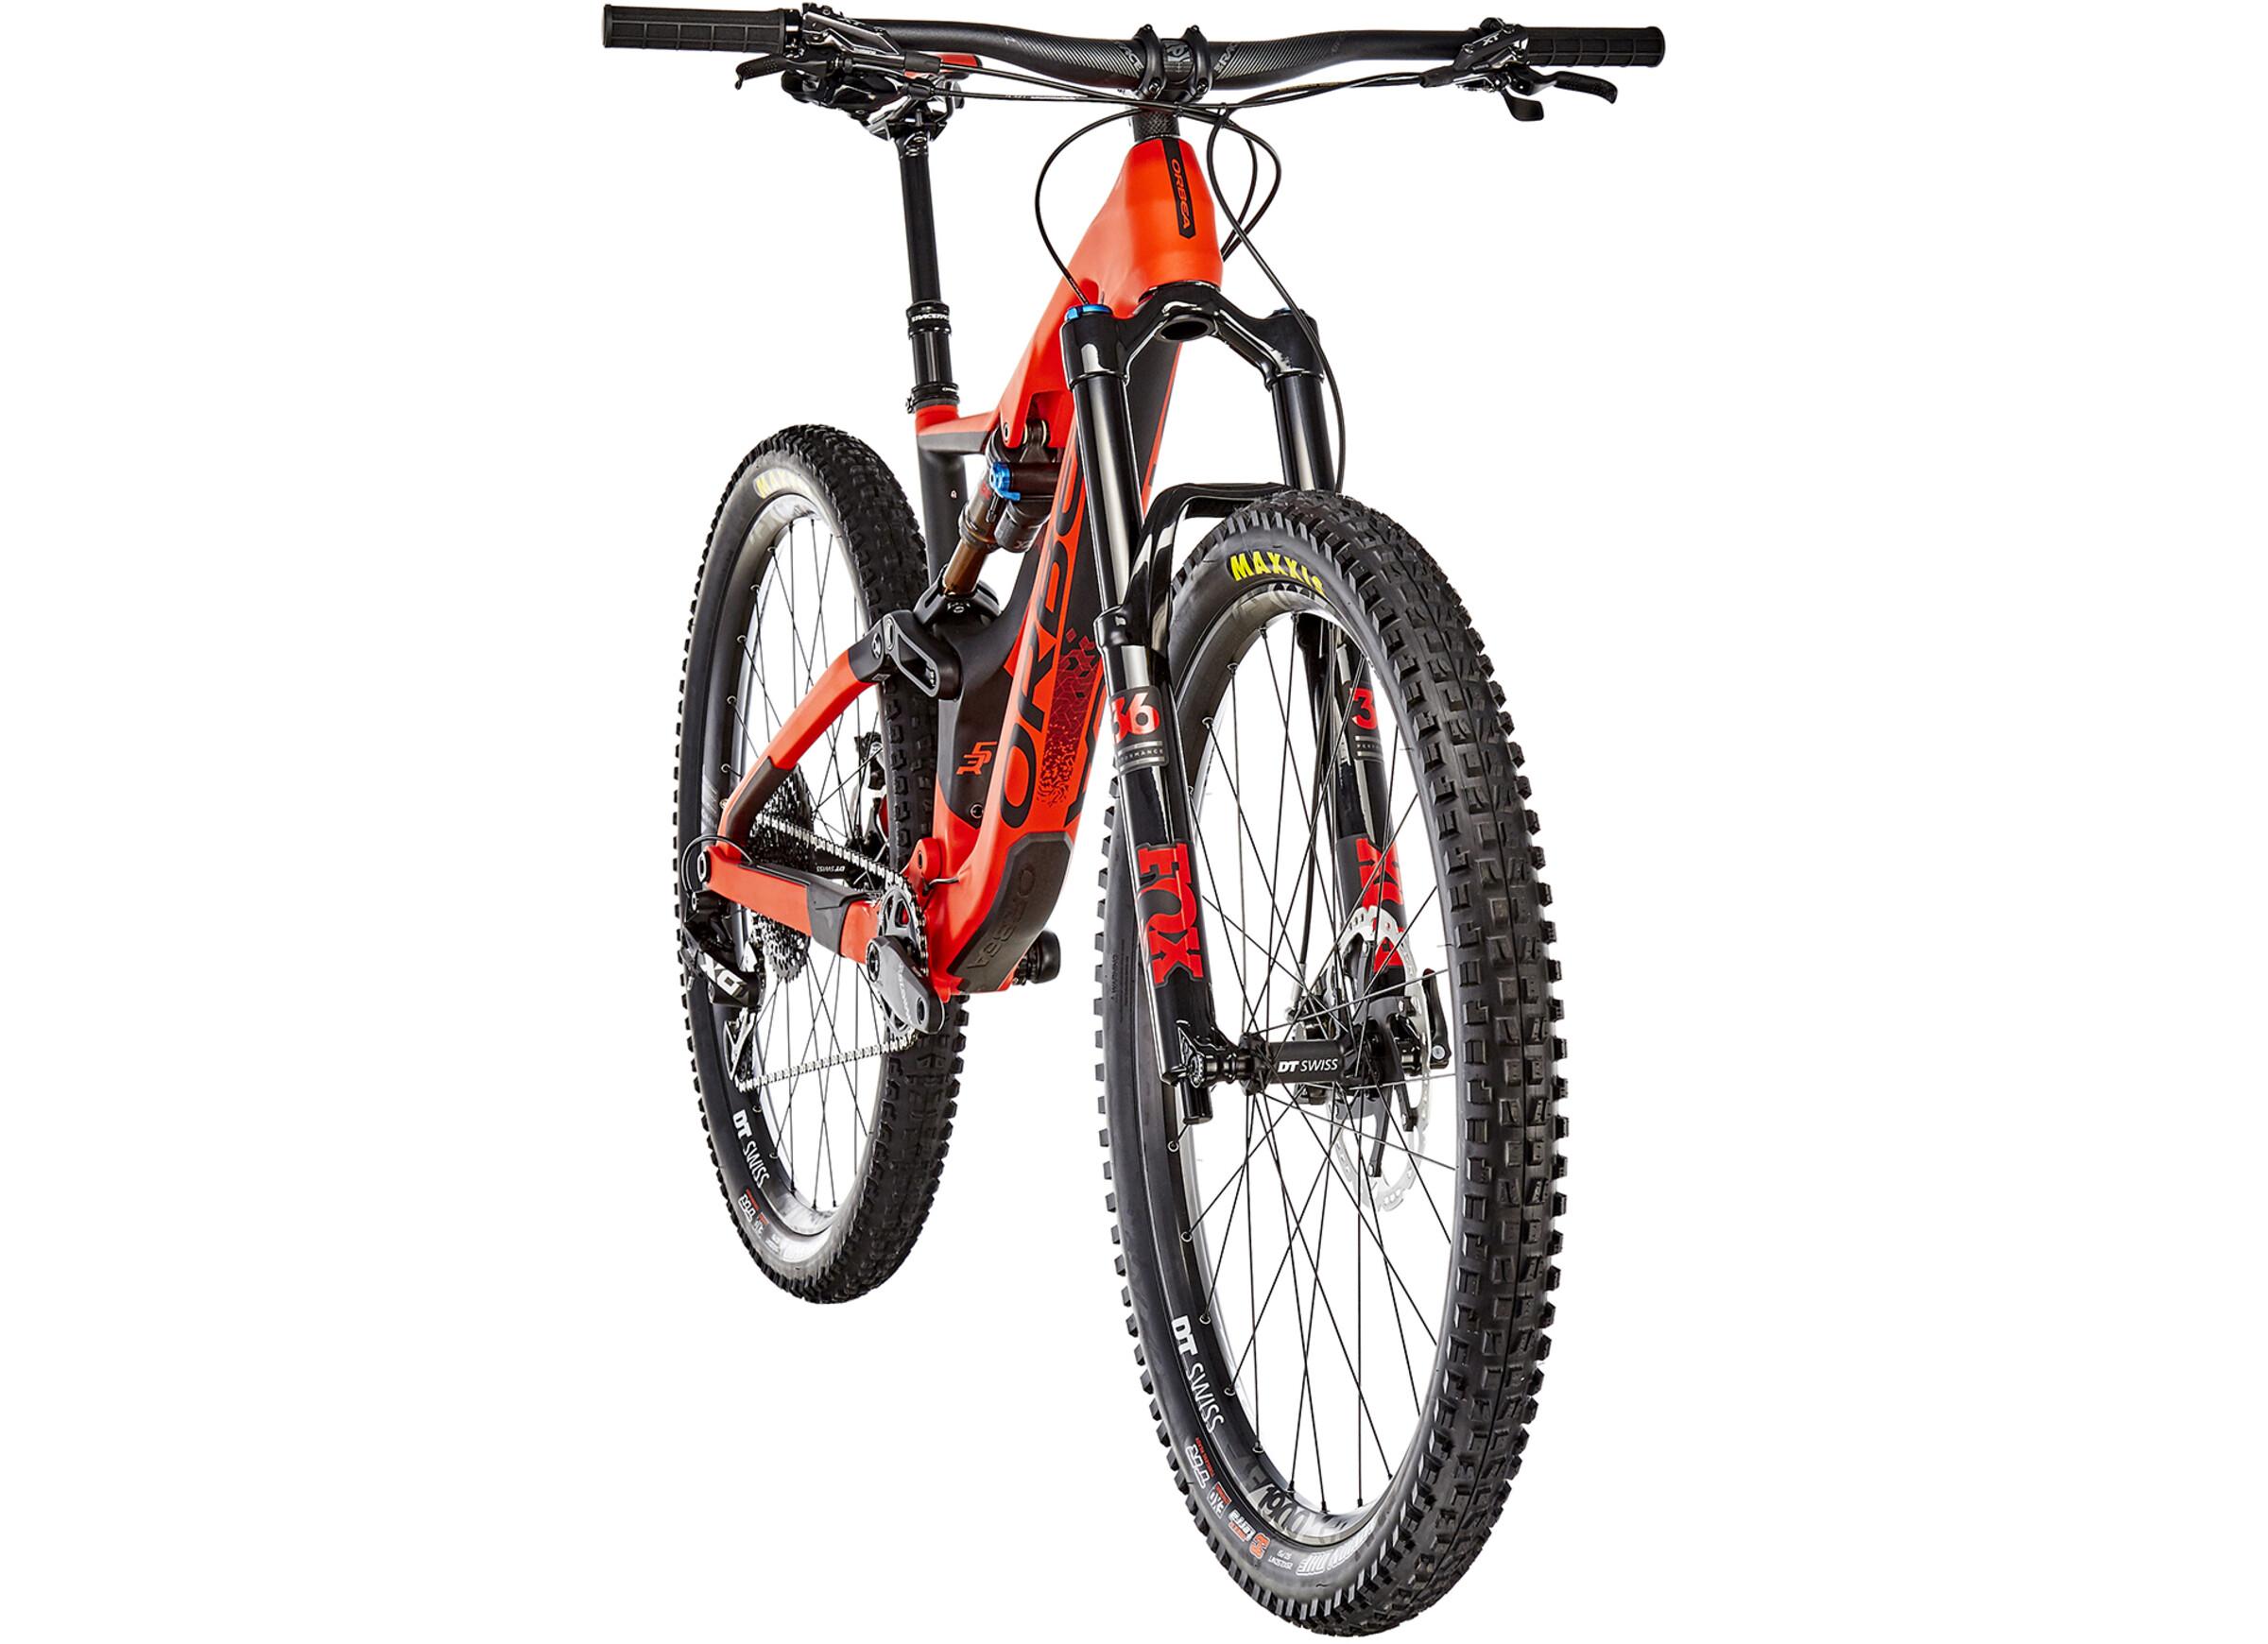 ORBEA Rallon M10, red/black I Bikester.be